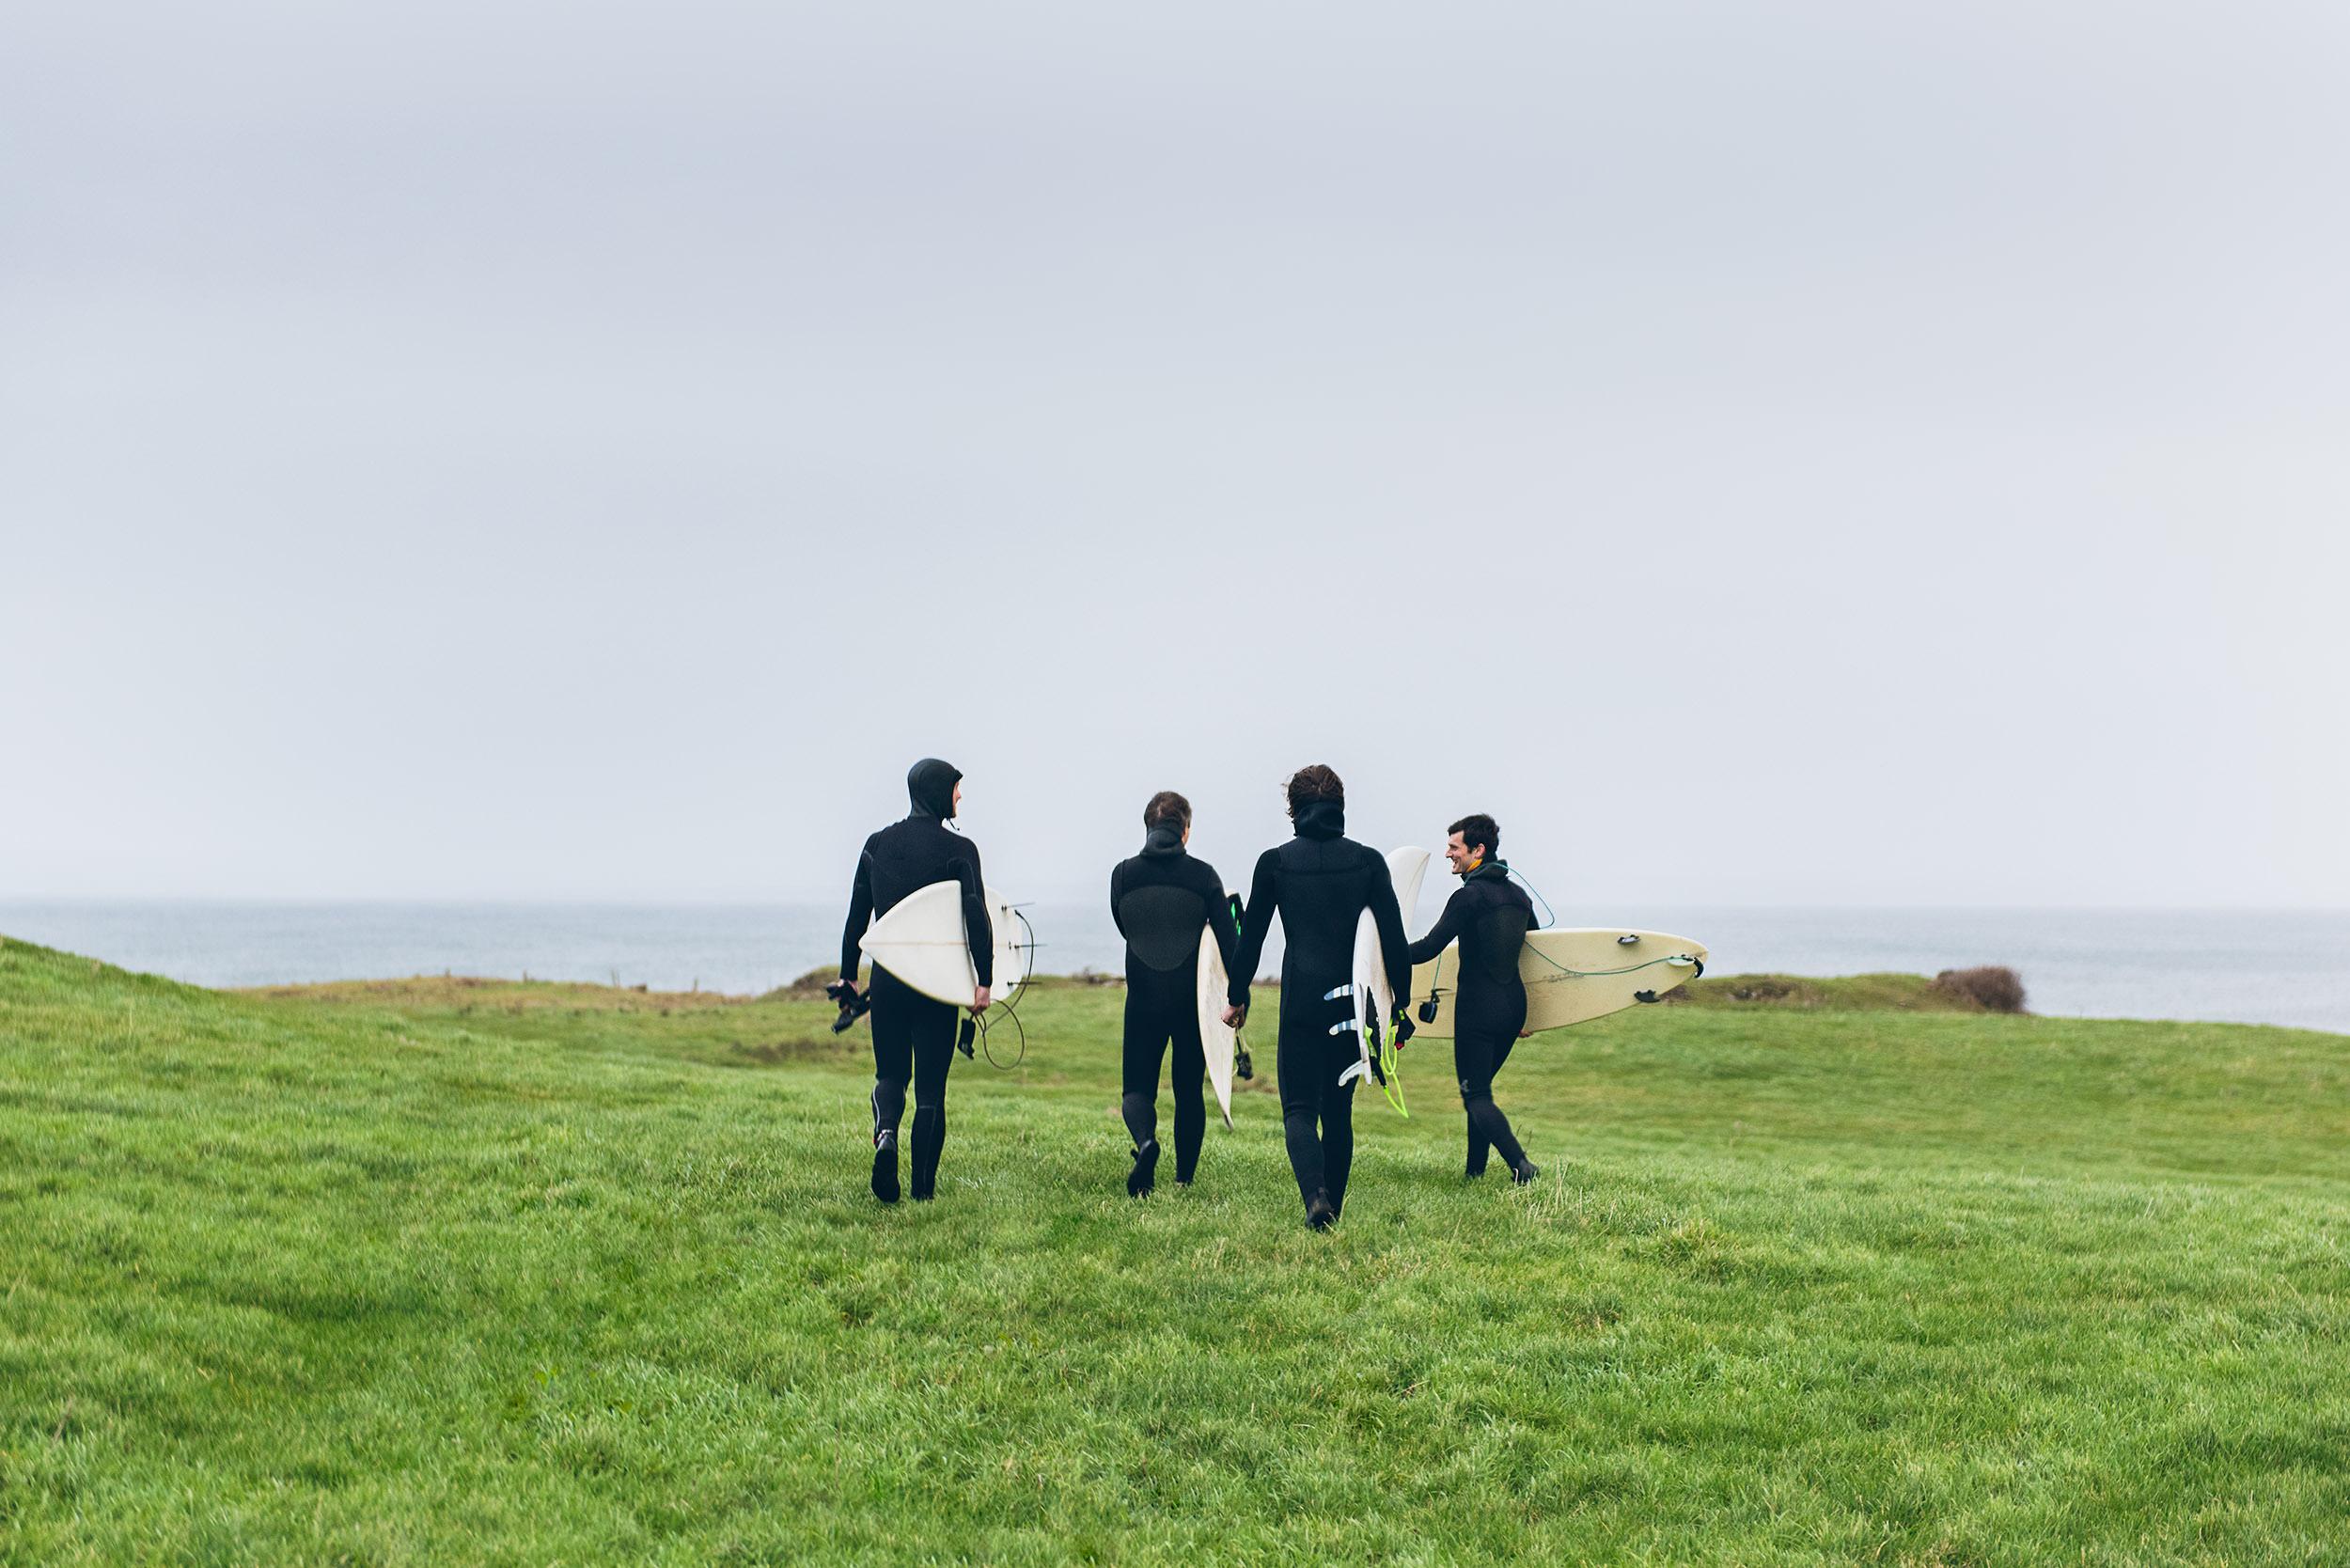 20-outdoor-adventure-surfing-winter-ireland-surfers.jpg